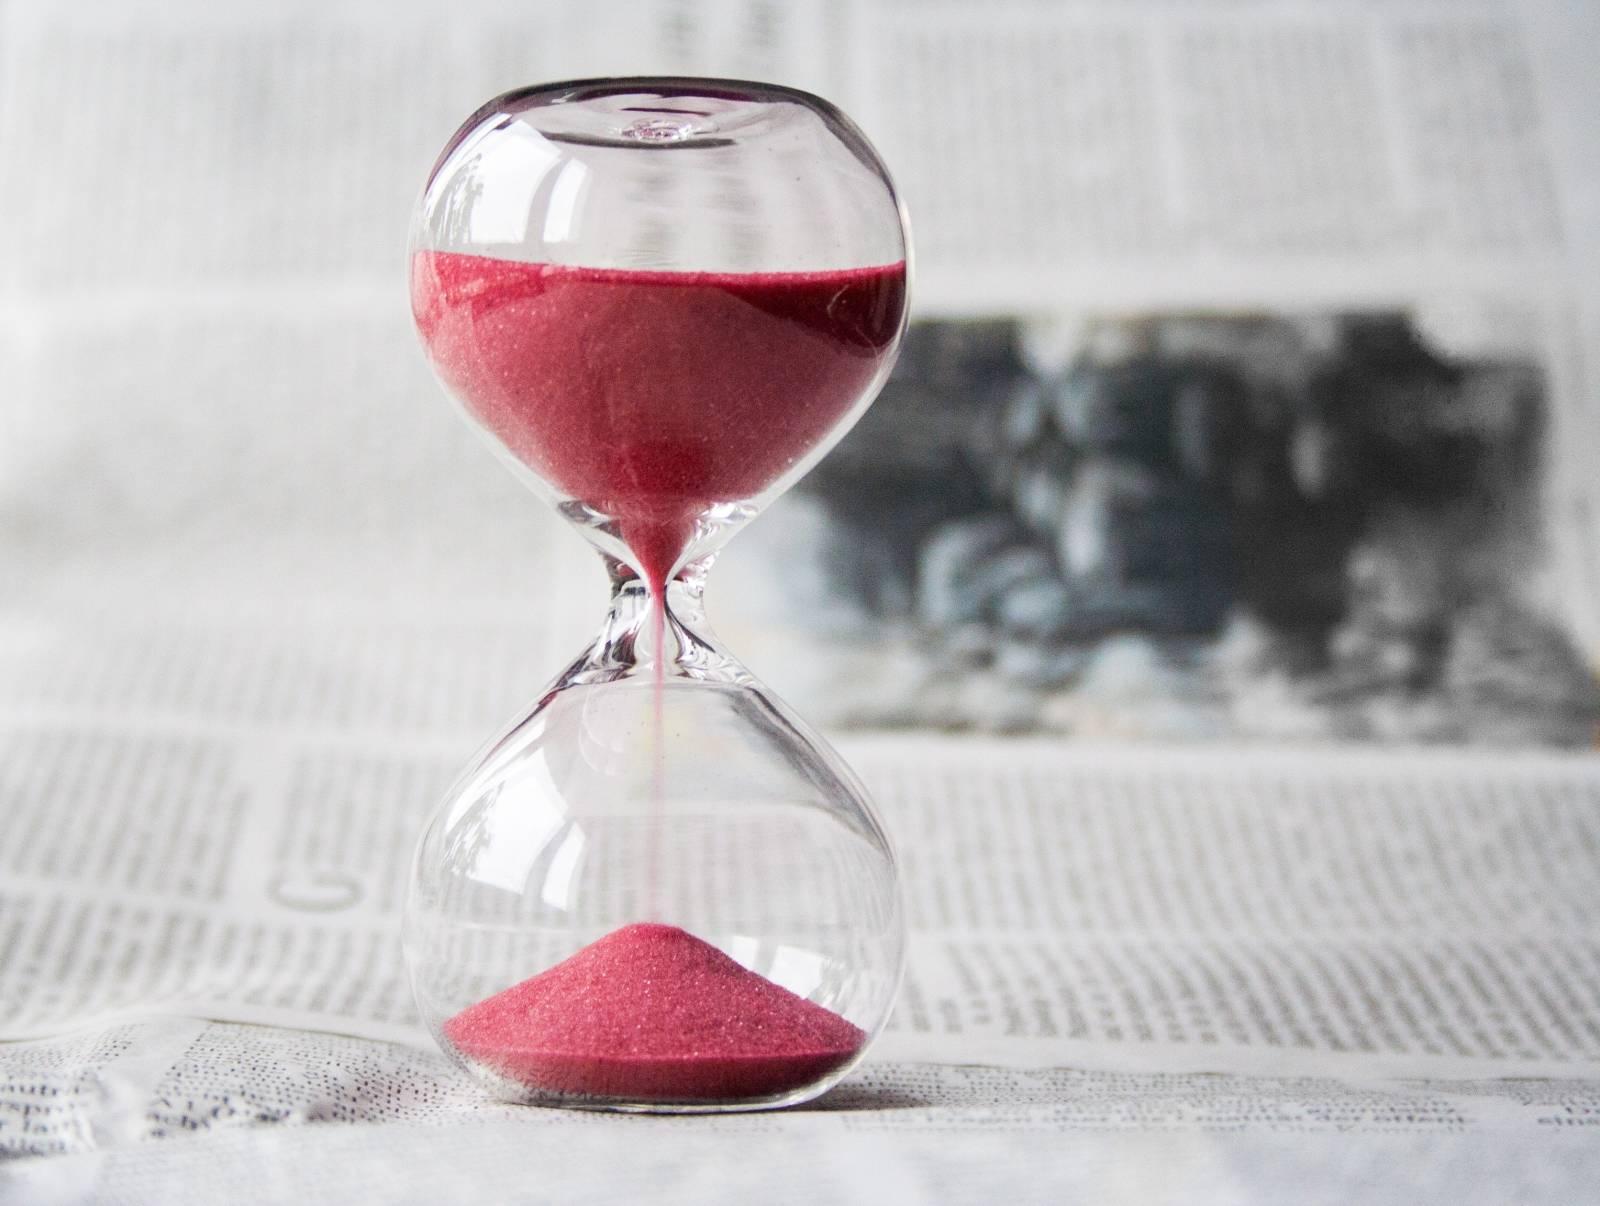 Combien De Temps Dure Un Divorce A L Amiable Avec Un Avocat A